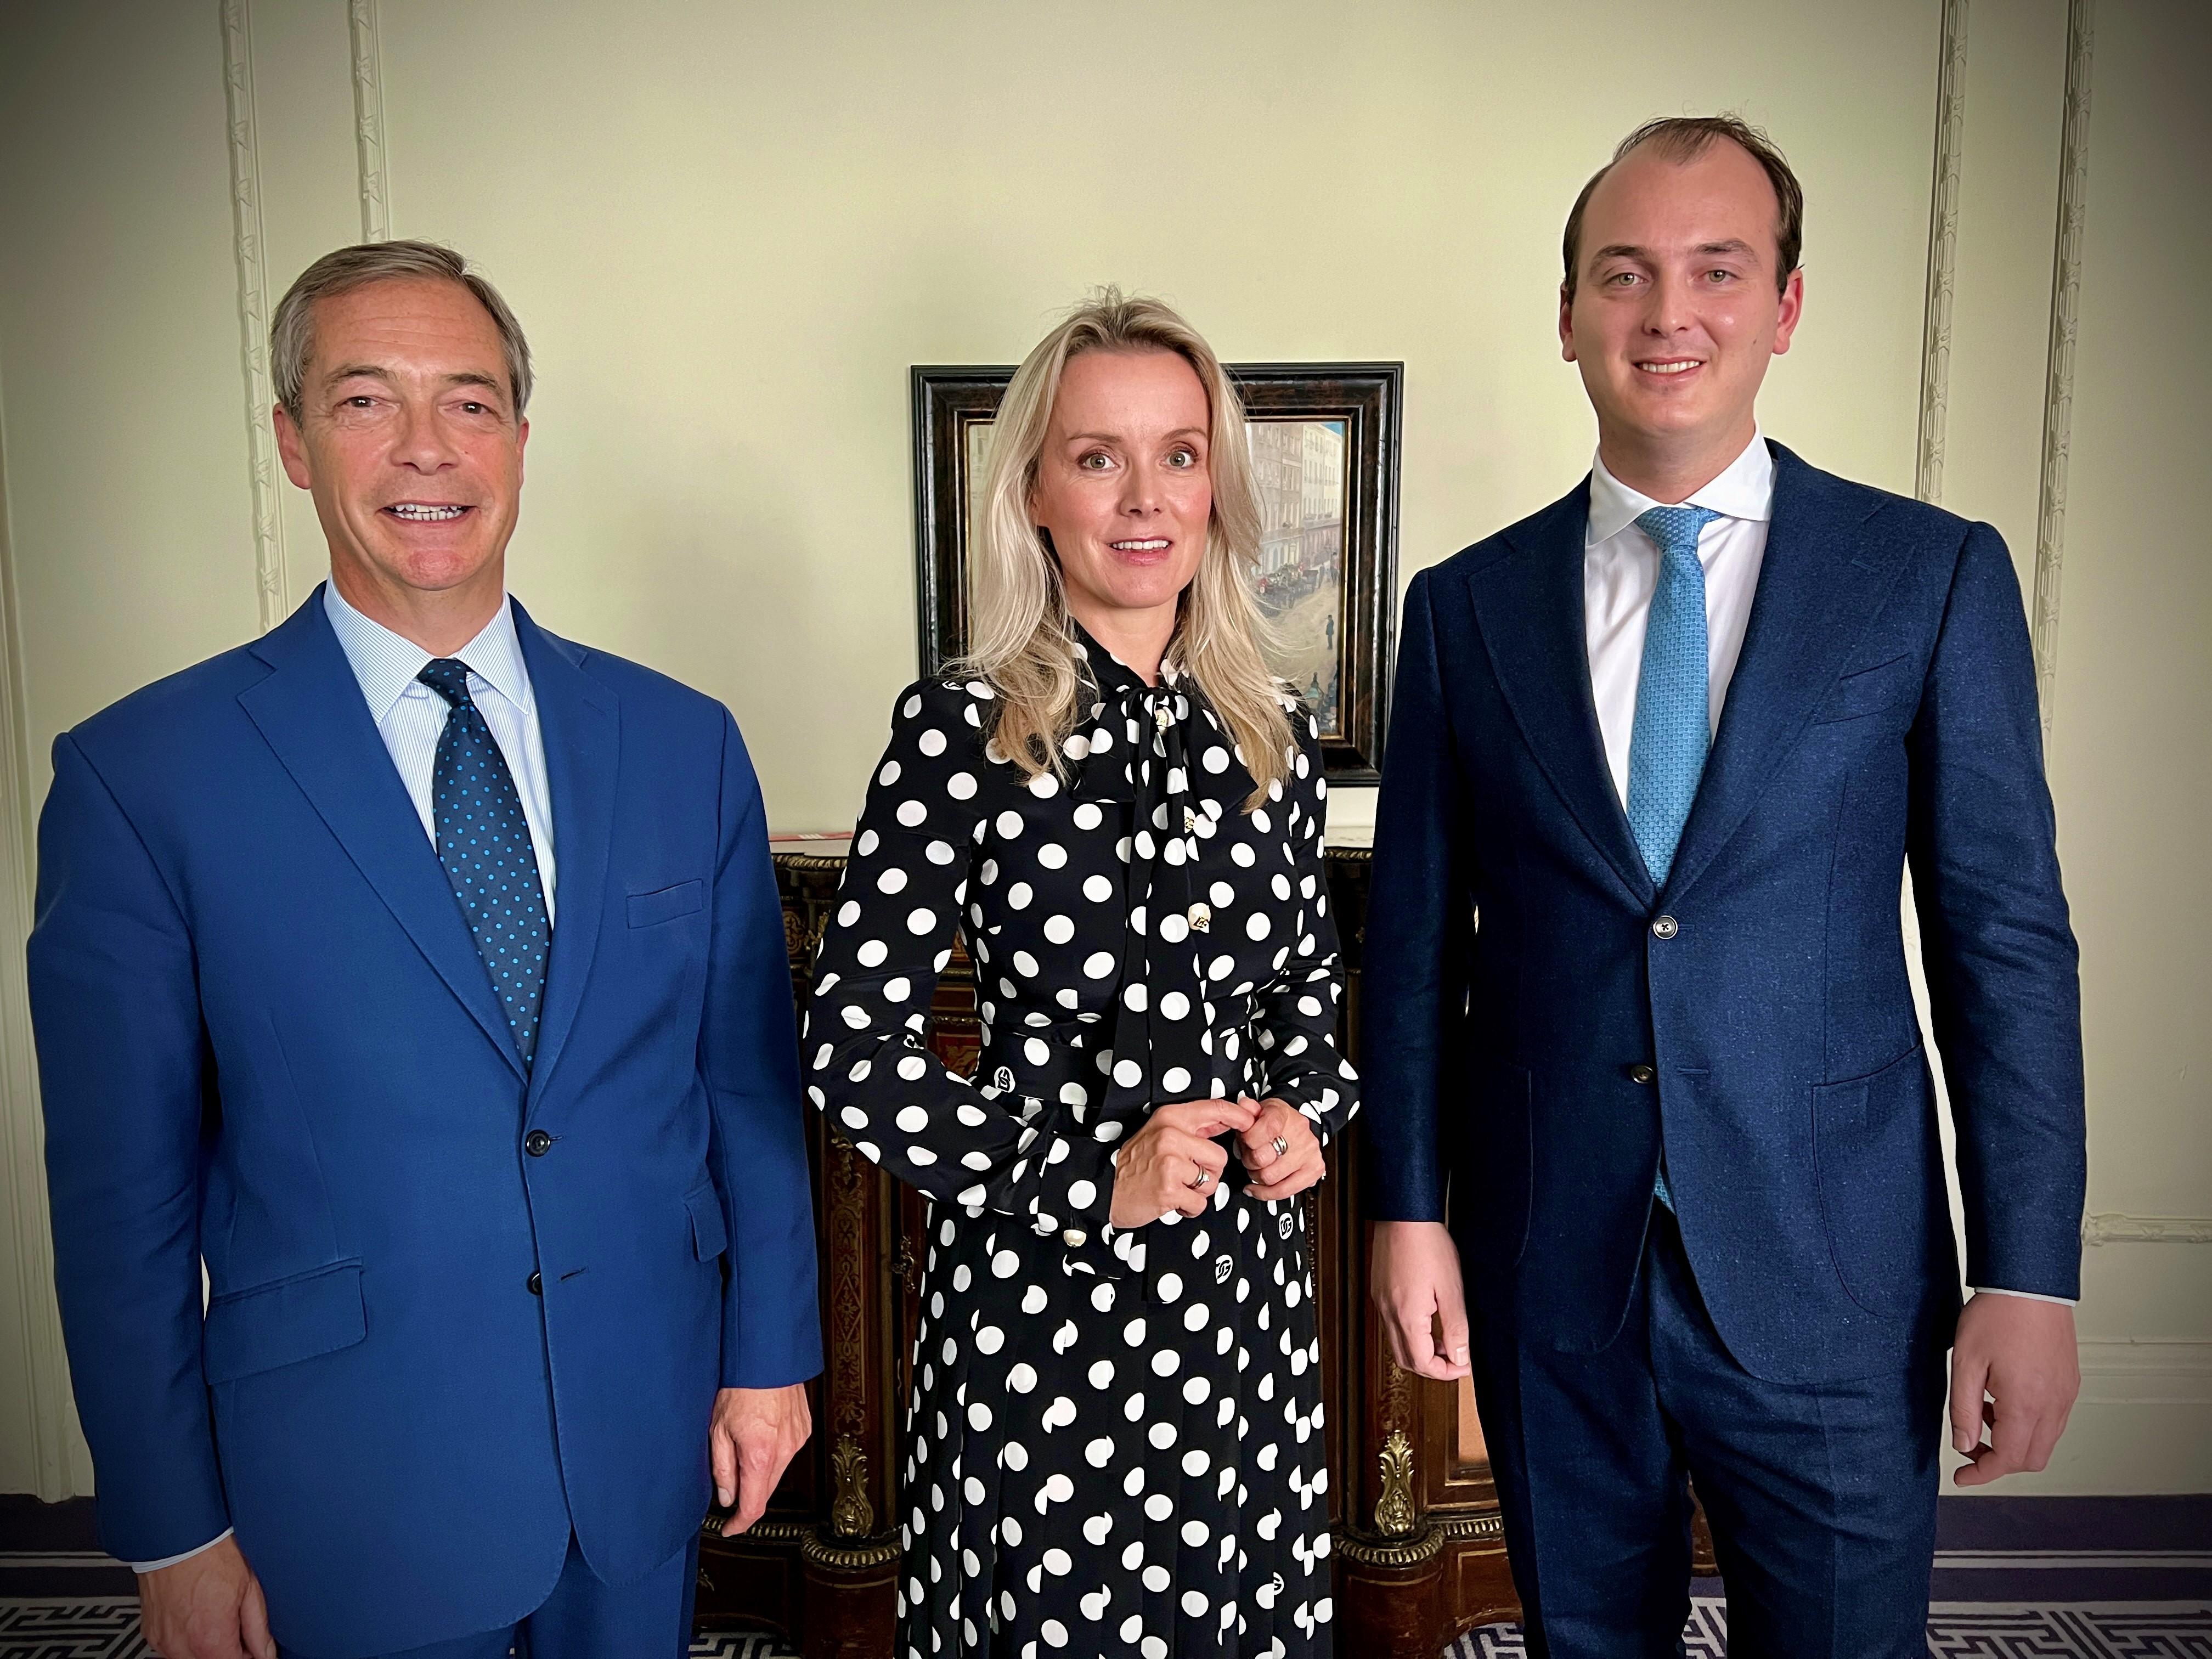 DGB Group, Nigel Farage